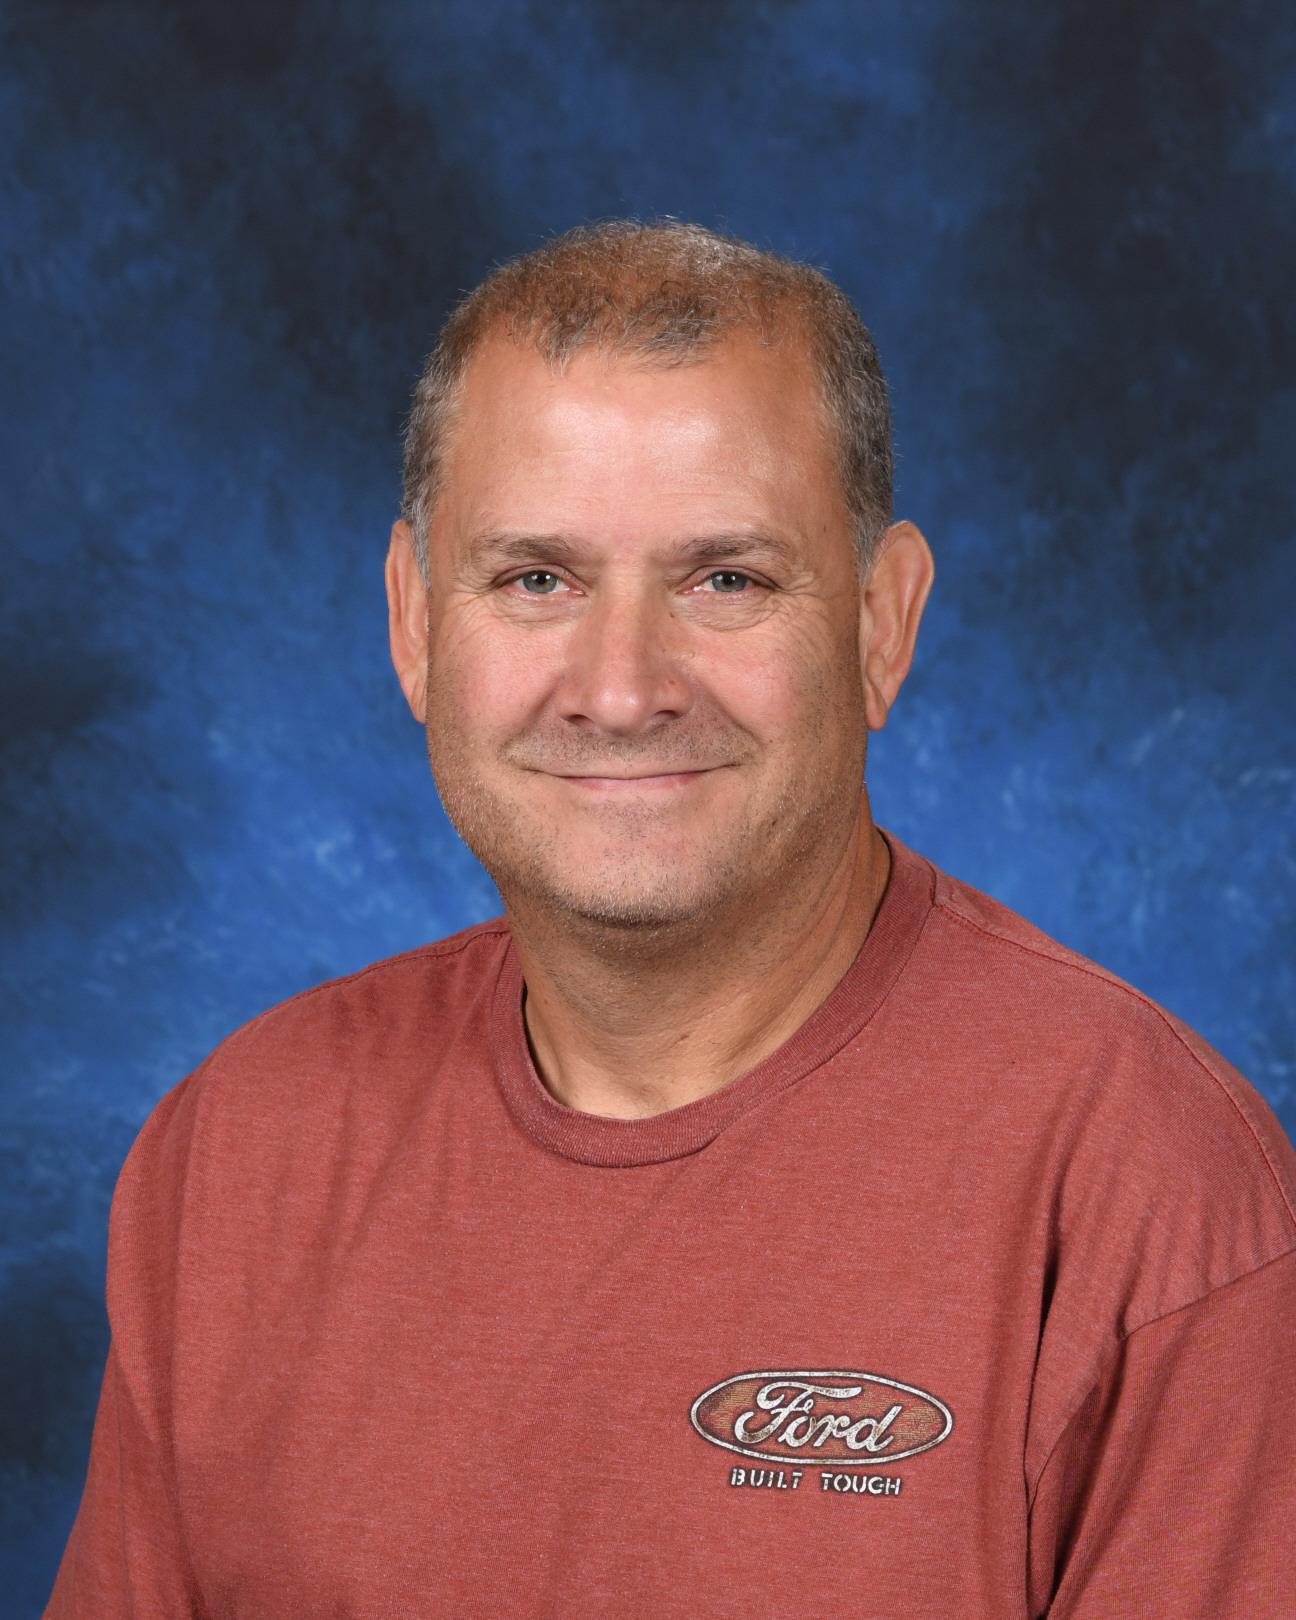 Photo of David Powell.